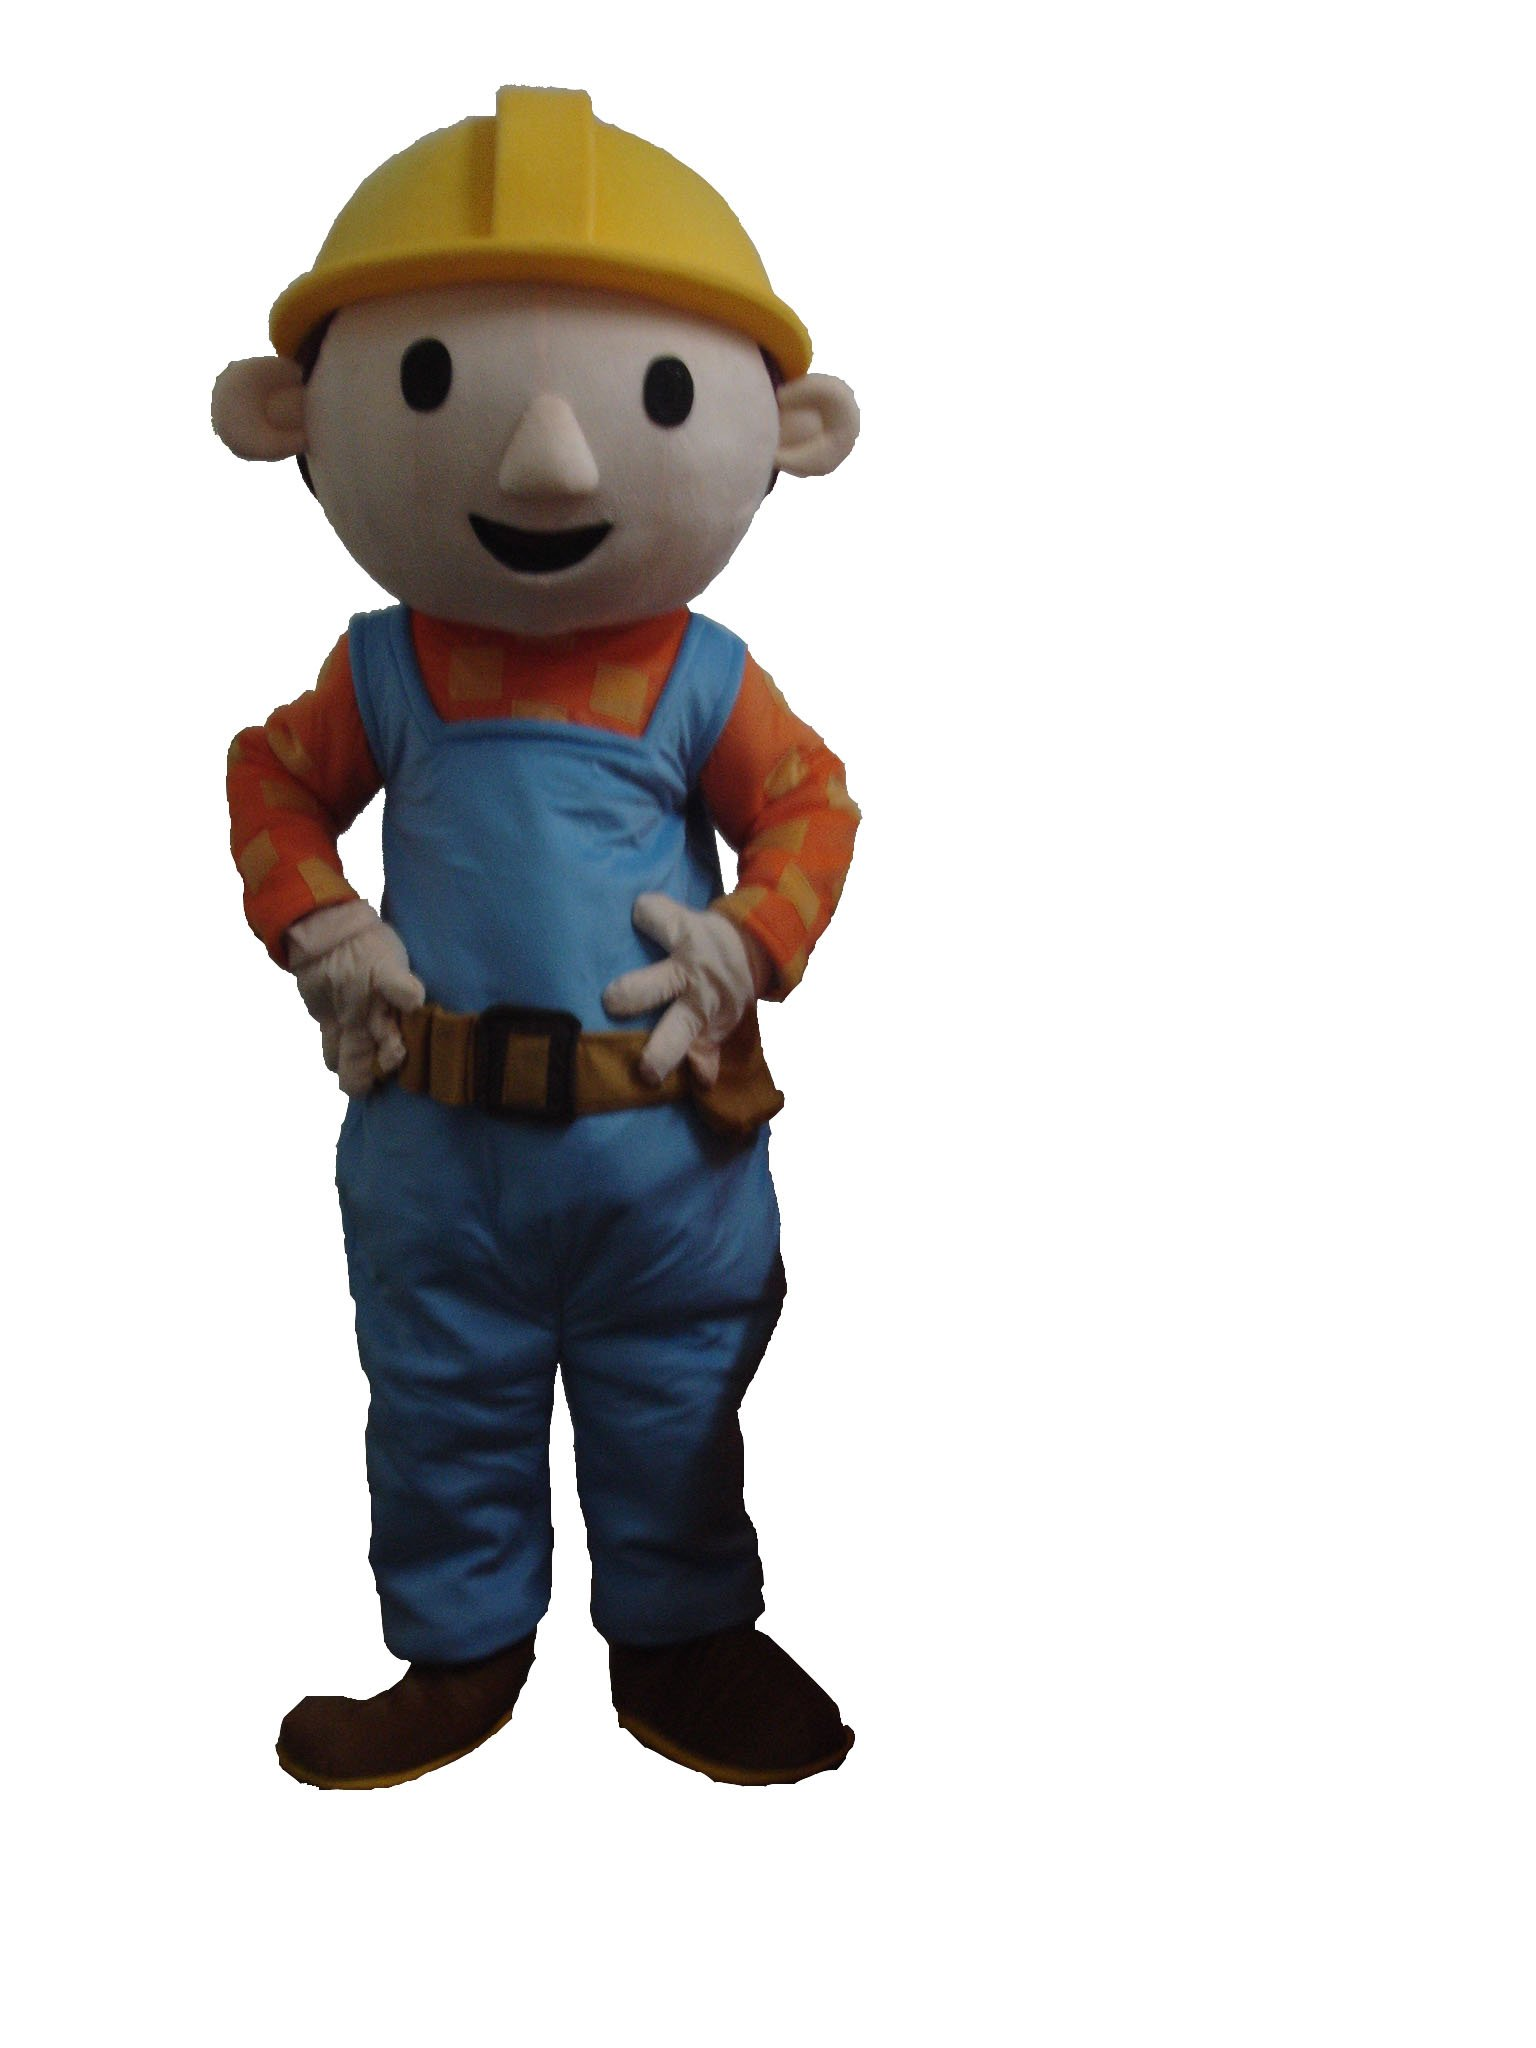 Profession Bob the Builder Mascot Costumes Halloween Cartoon Adult Size